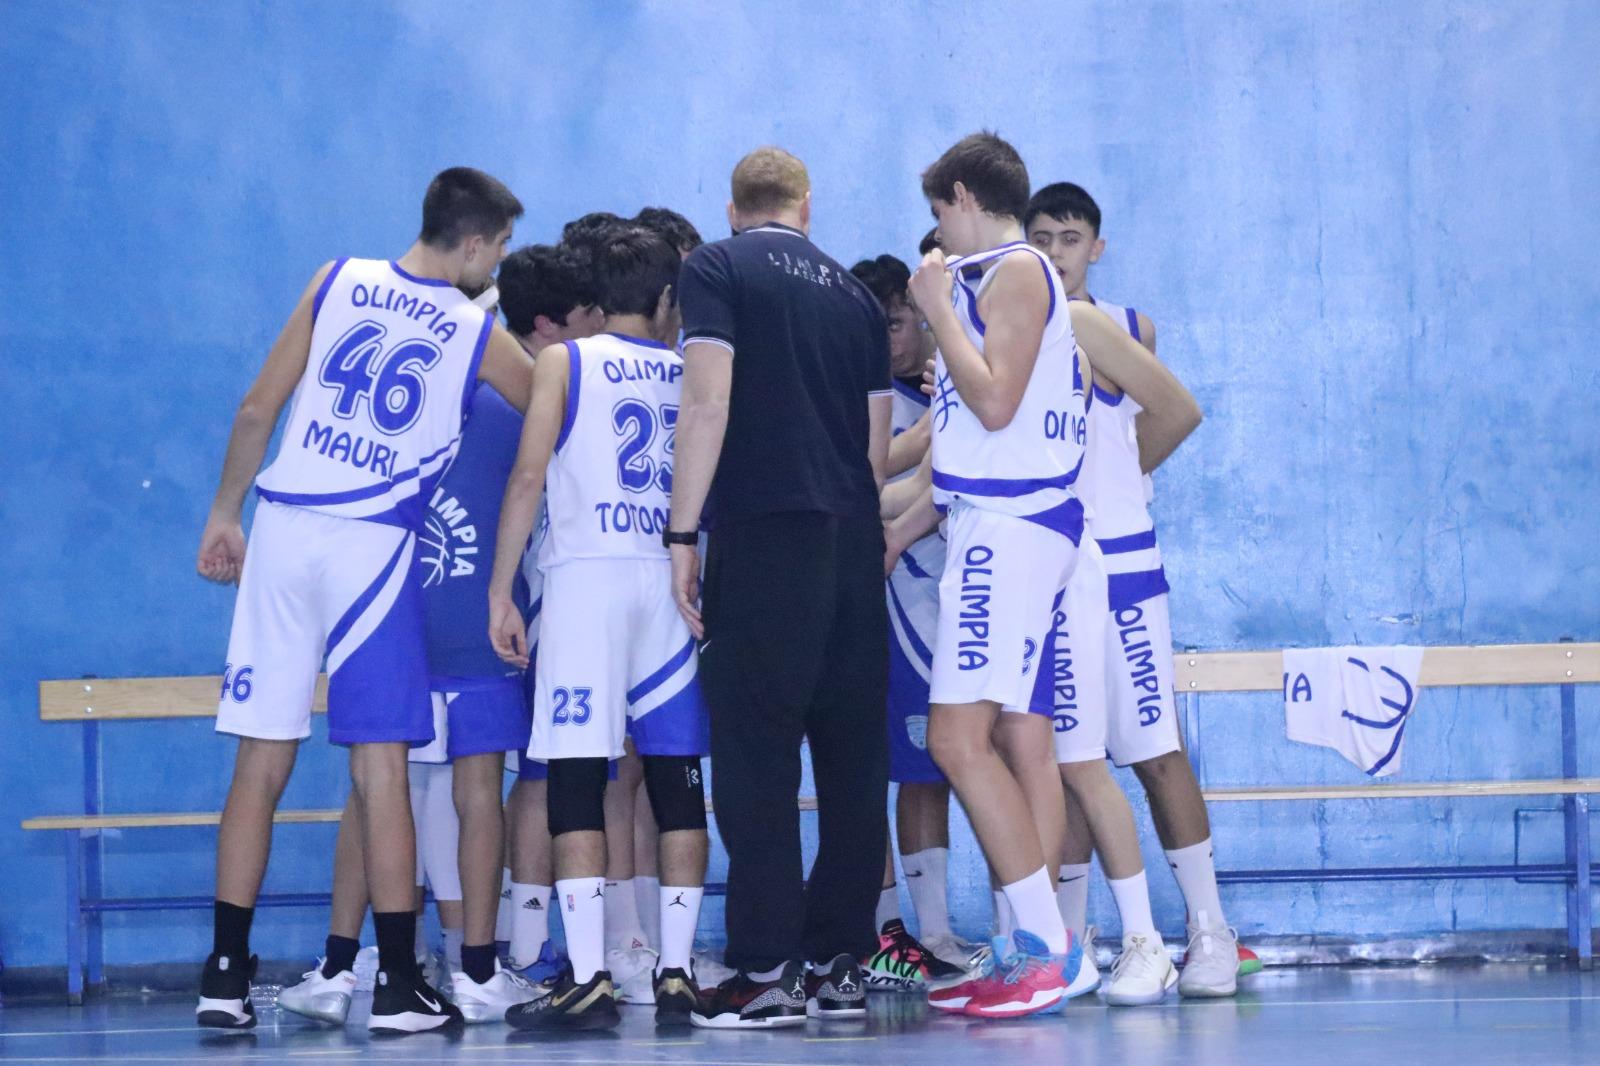 U16S Olimpia Roma - Roma Eur  69 - 52 1